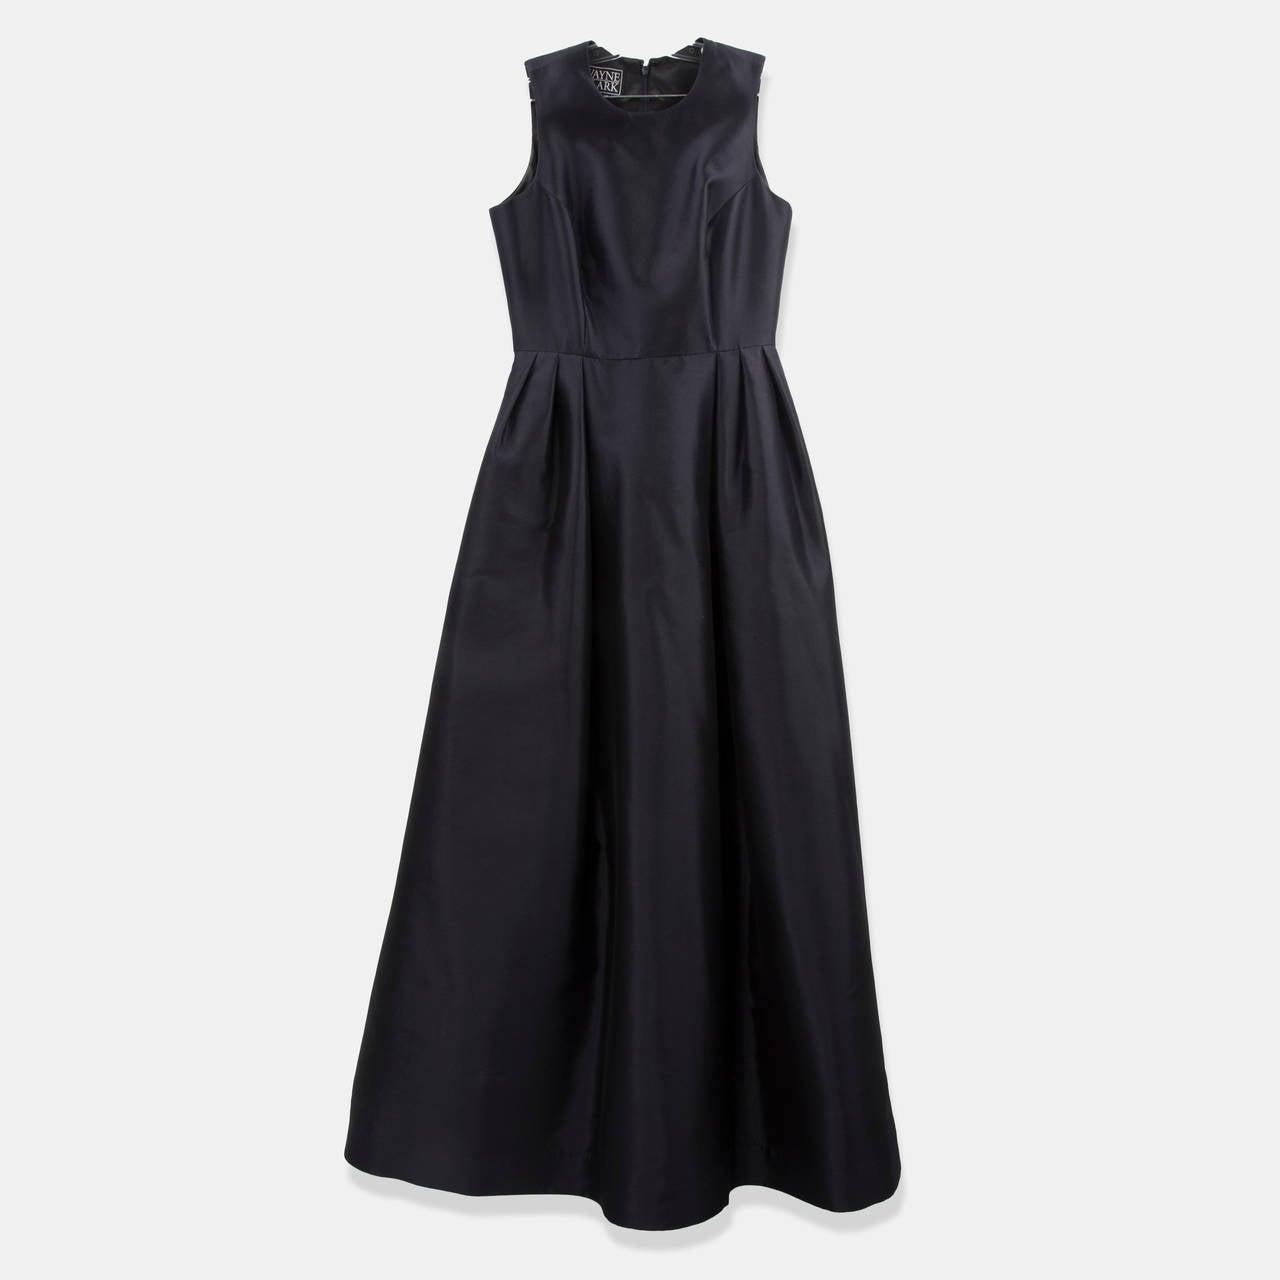 Wayne Clark Black Gold Belted Gown For Sale 1